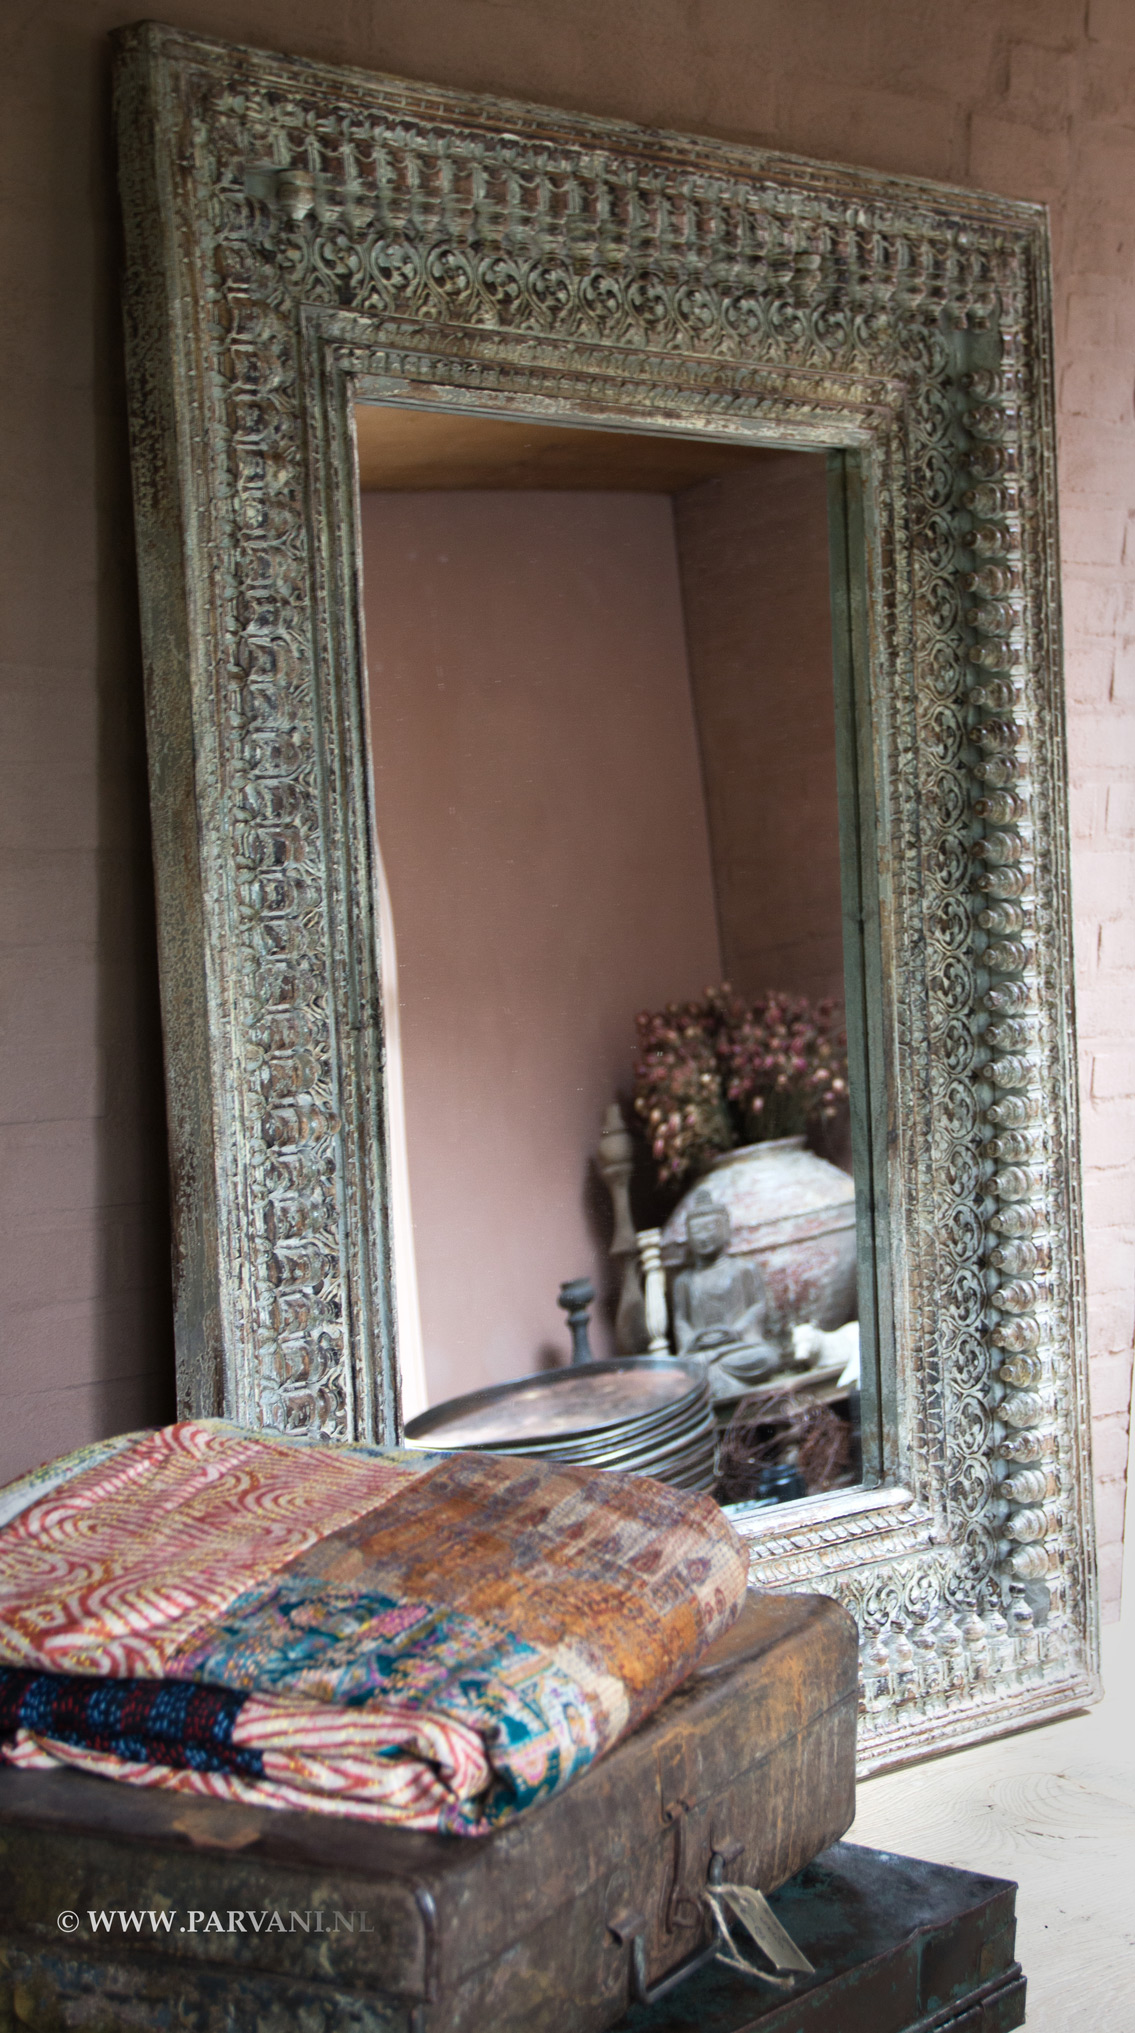 Grote Spiegel Hout.Parvani Spiegel India Lijst Hout Snijwerk Groot